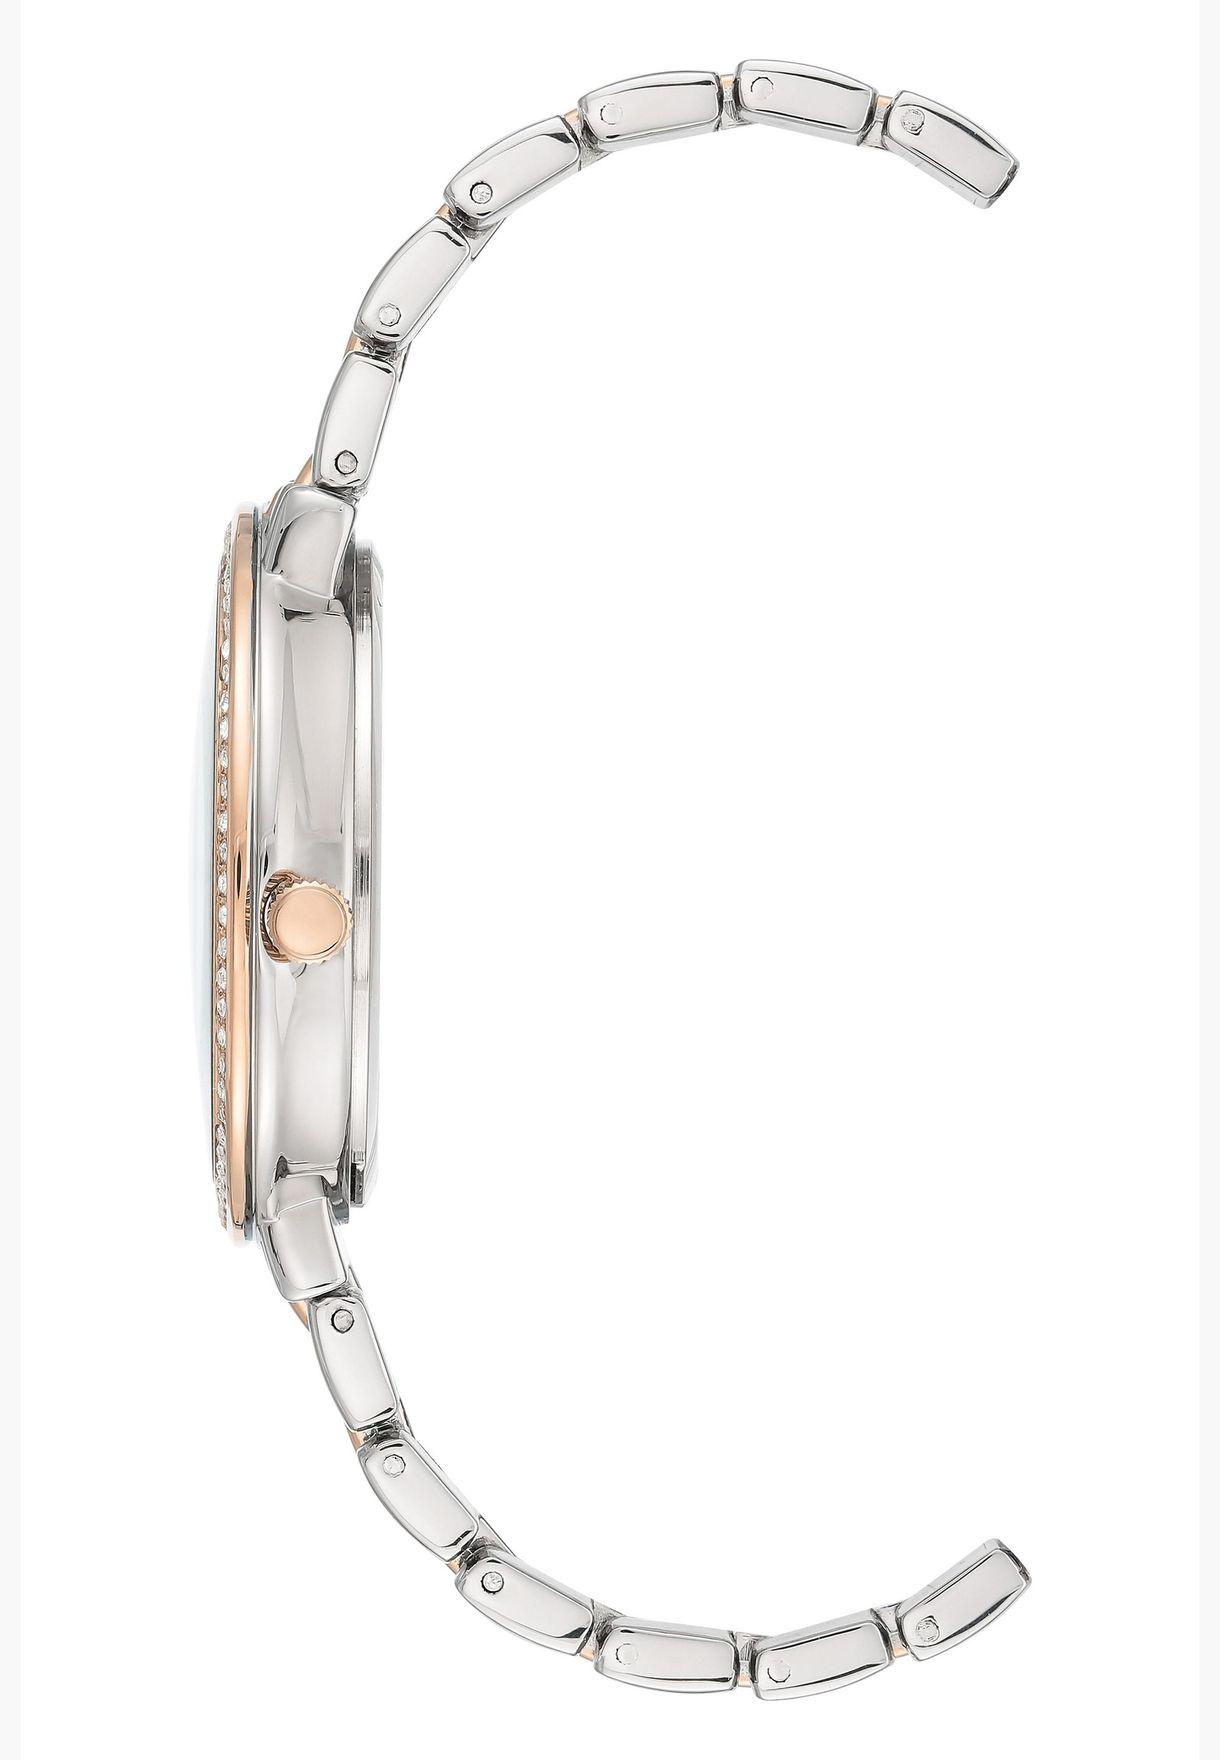 Anne Klein Metal Steel Strap Watch for Female - AK3799MPRT